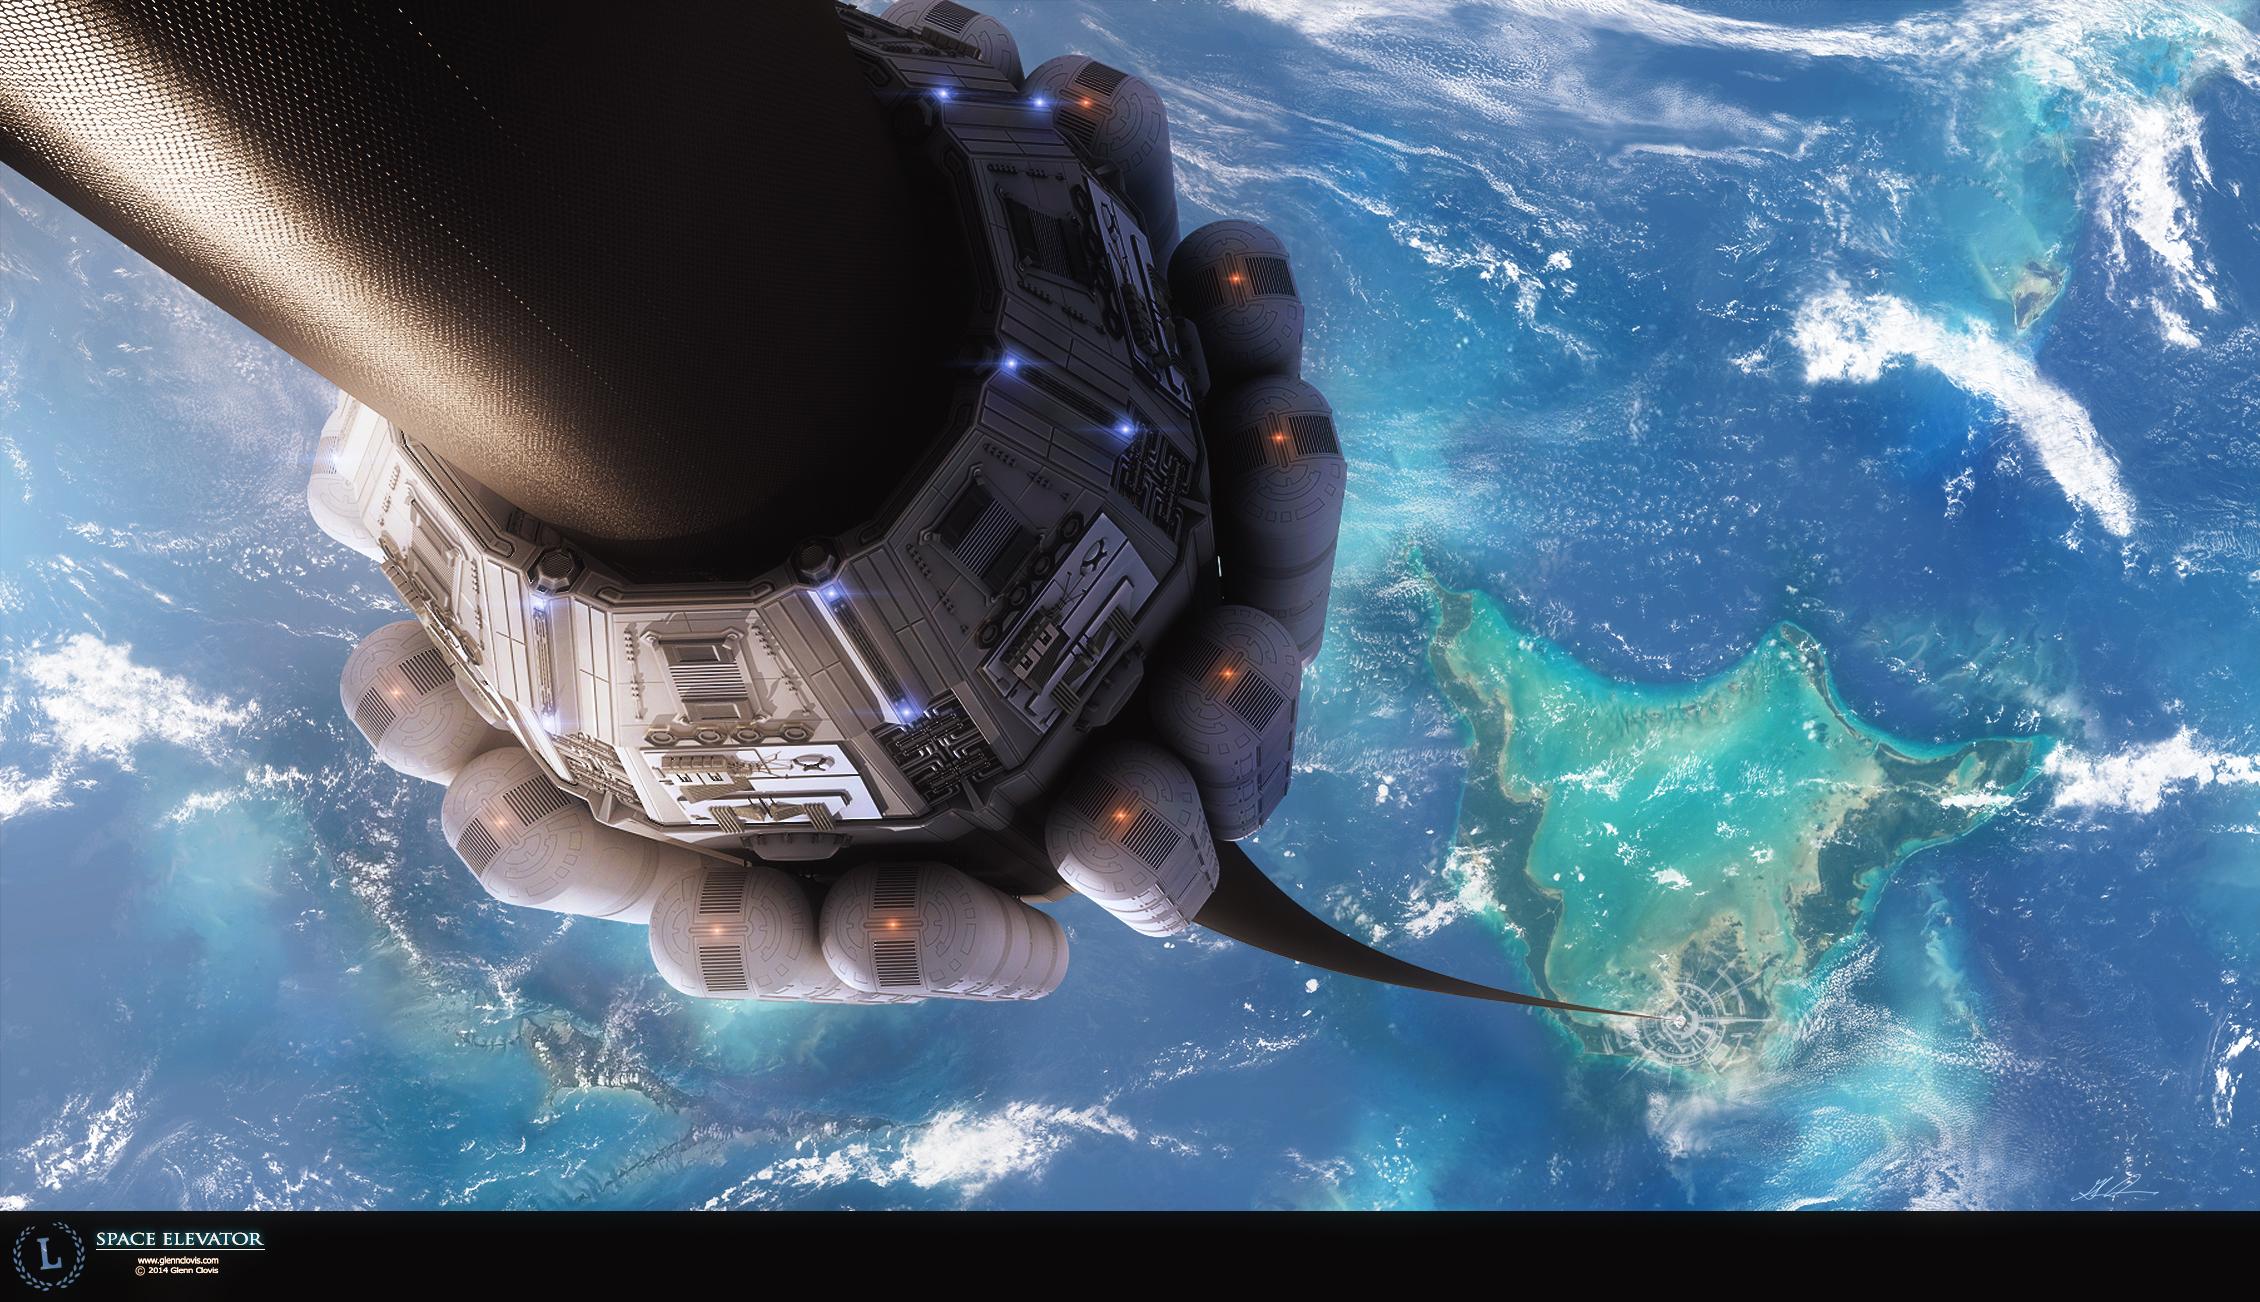 space_elevator_by_glennclovis-d7egmif